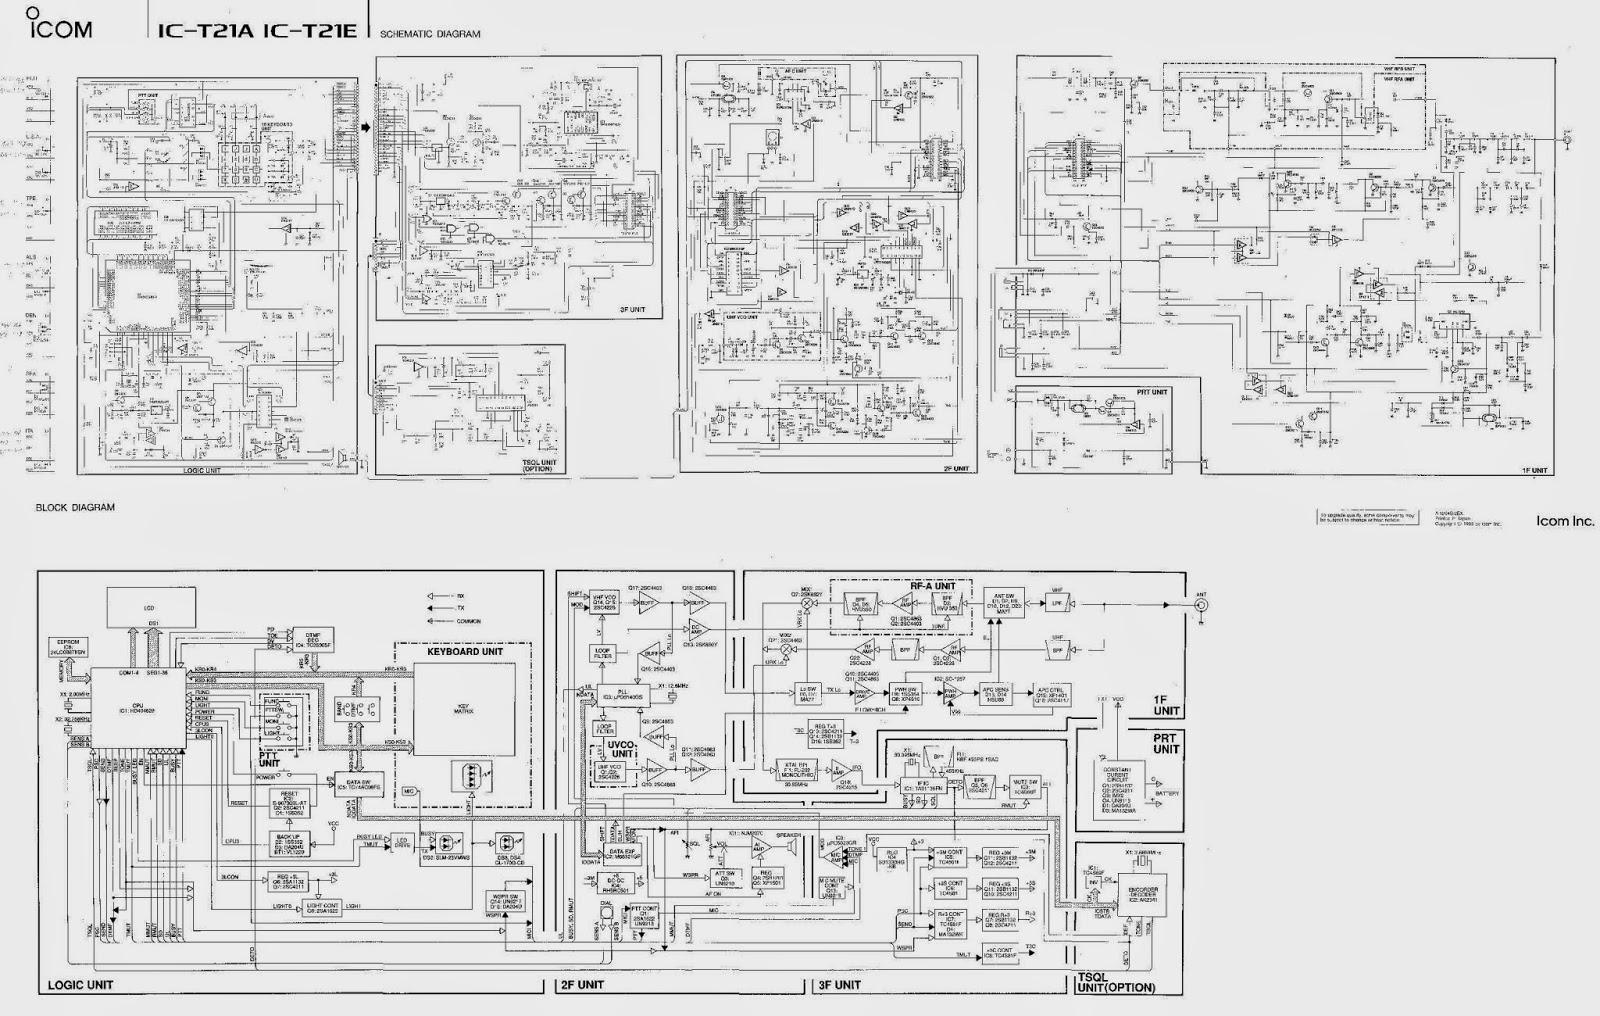 Icom Ic 746 Owners manual